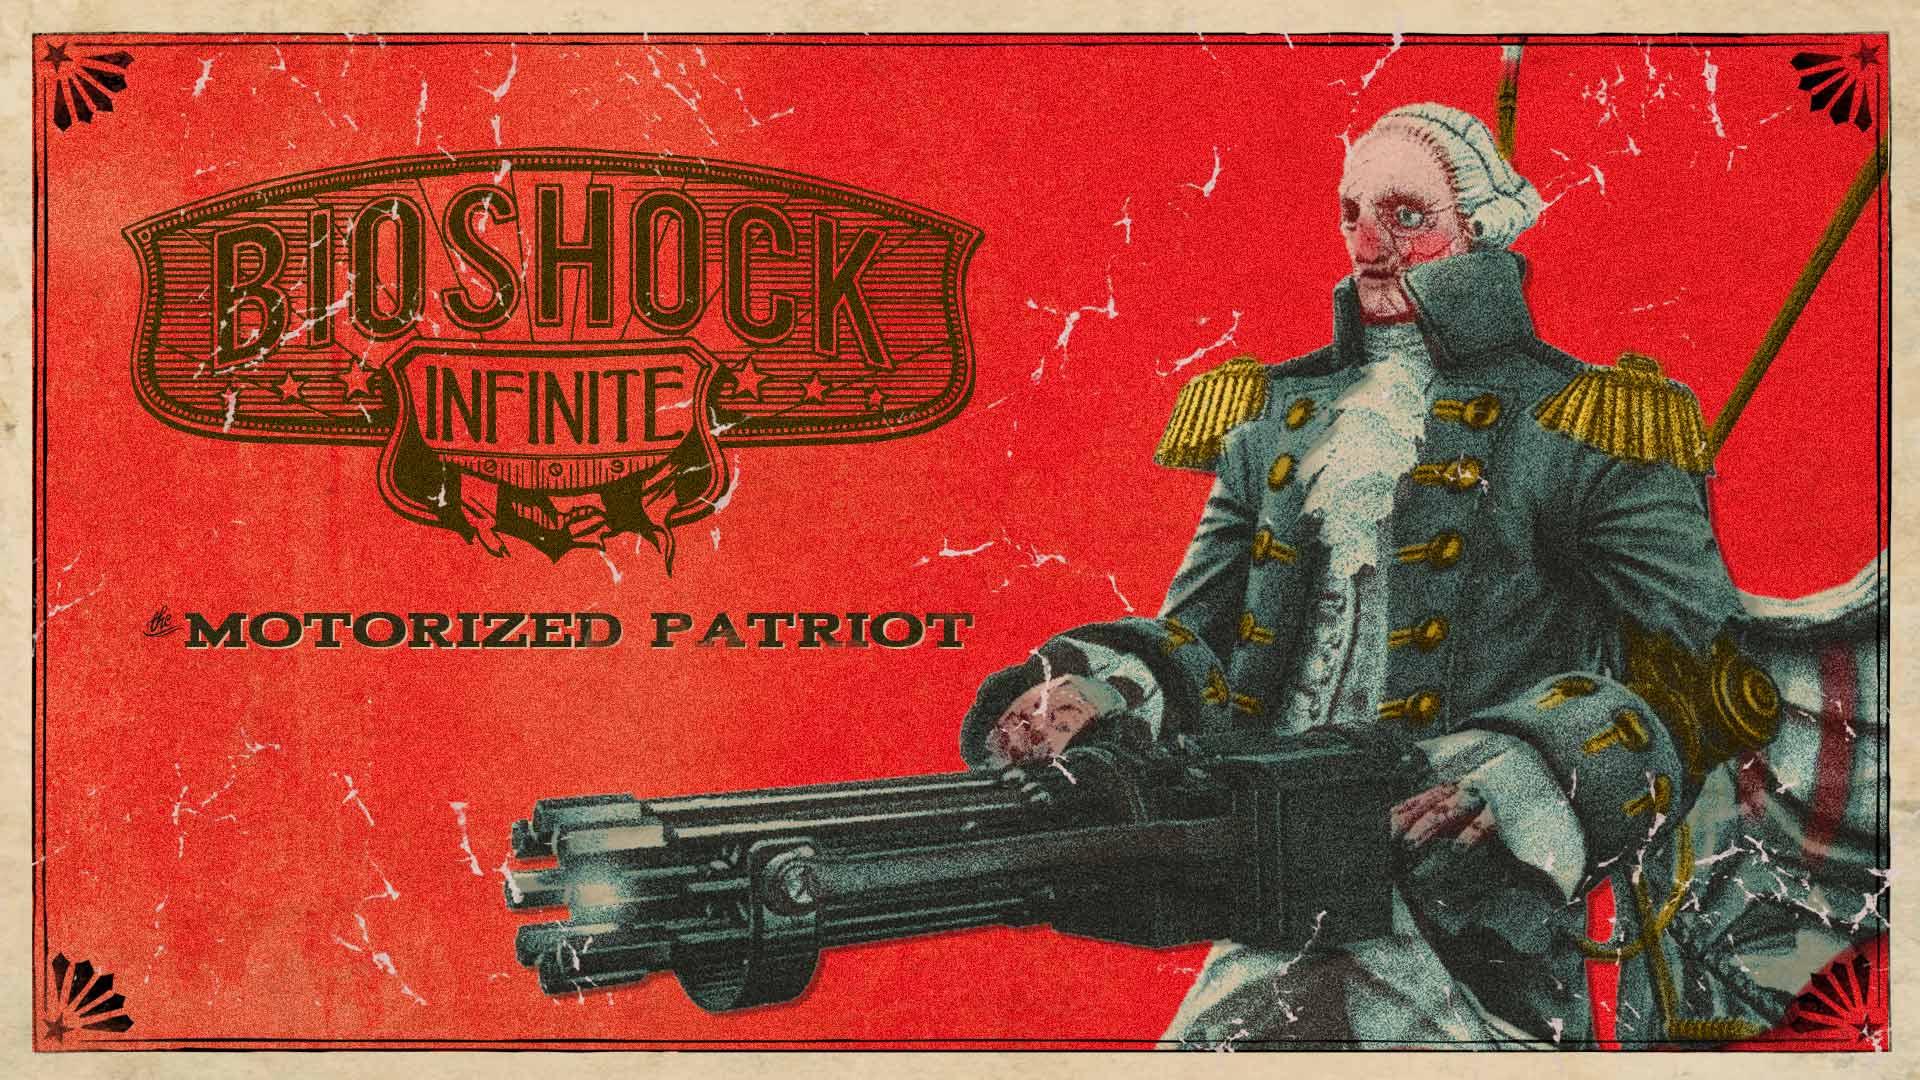 Image bioshock infinite artwork steam trading - Bioshock wikia ...